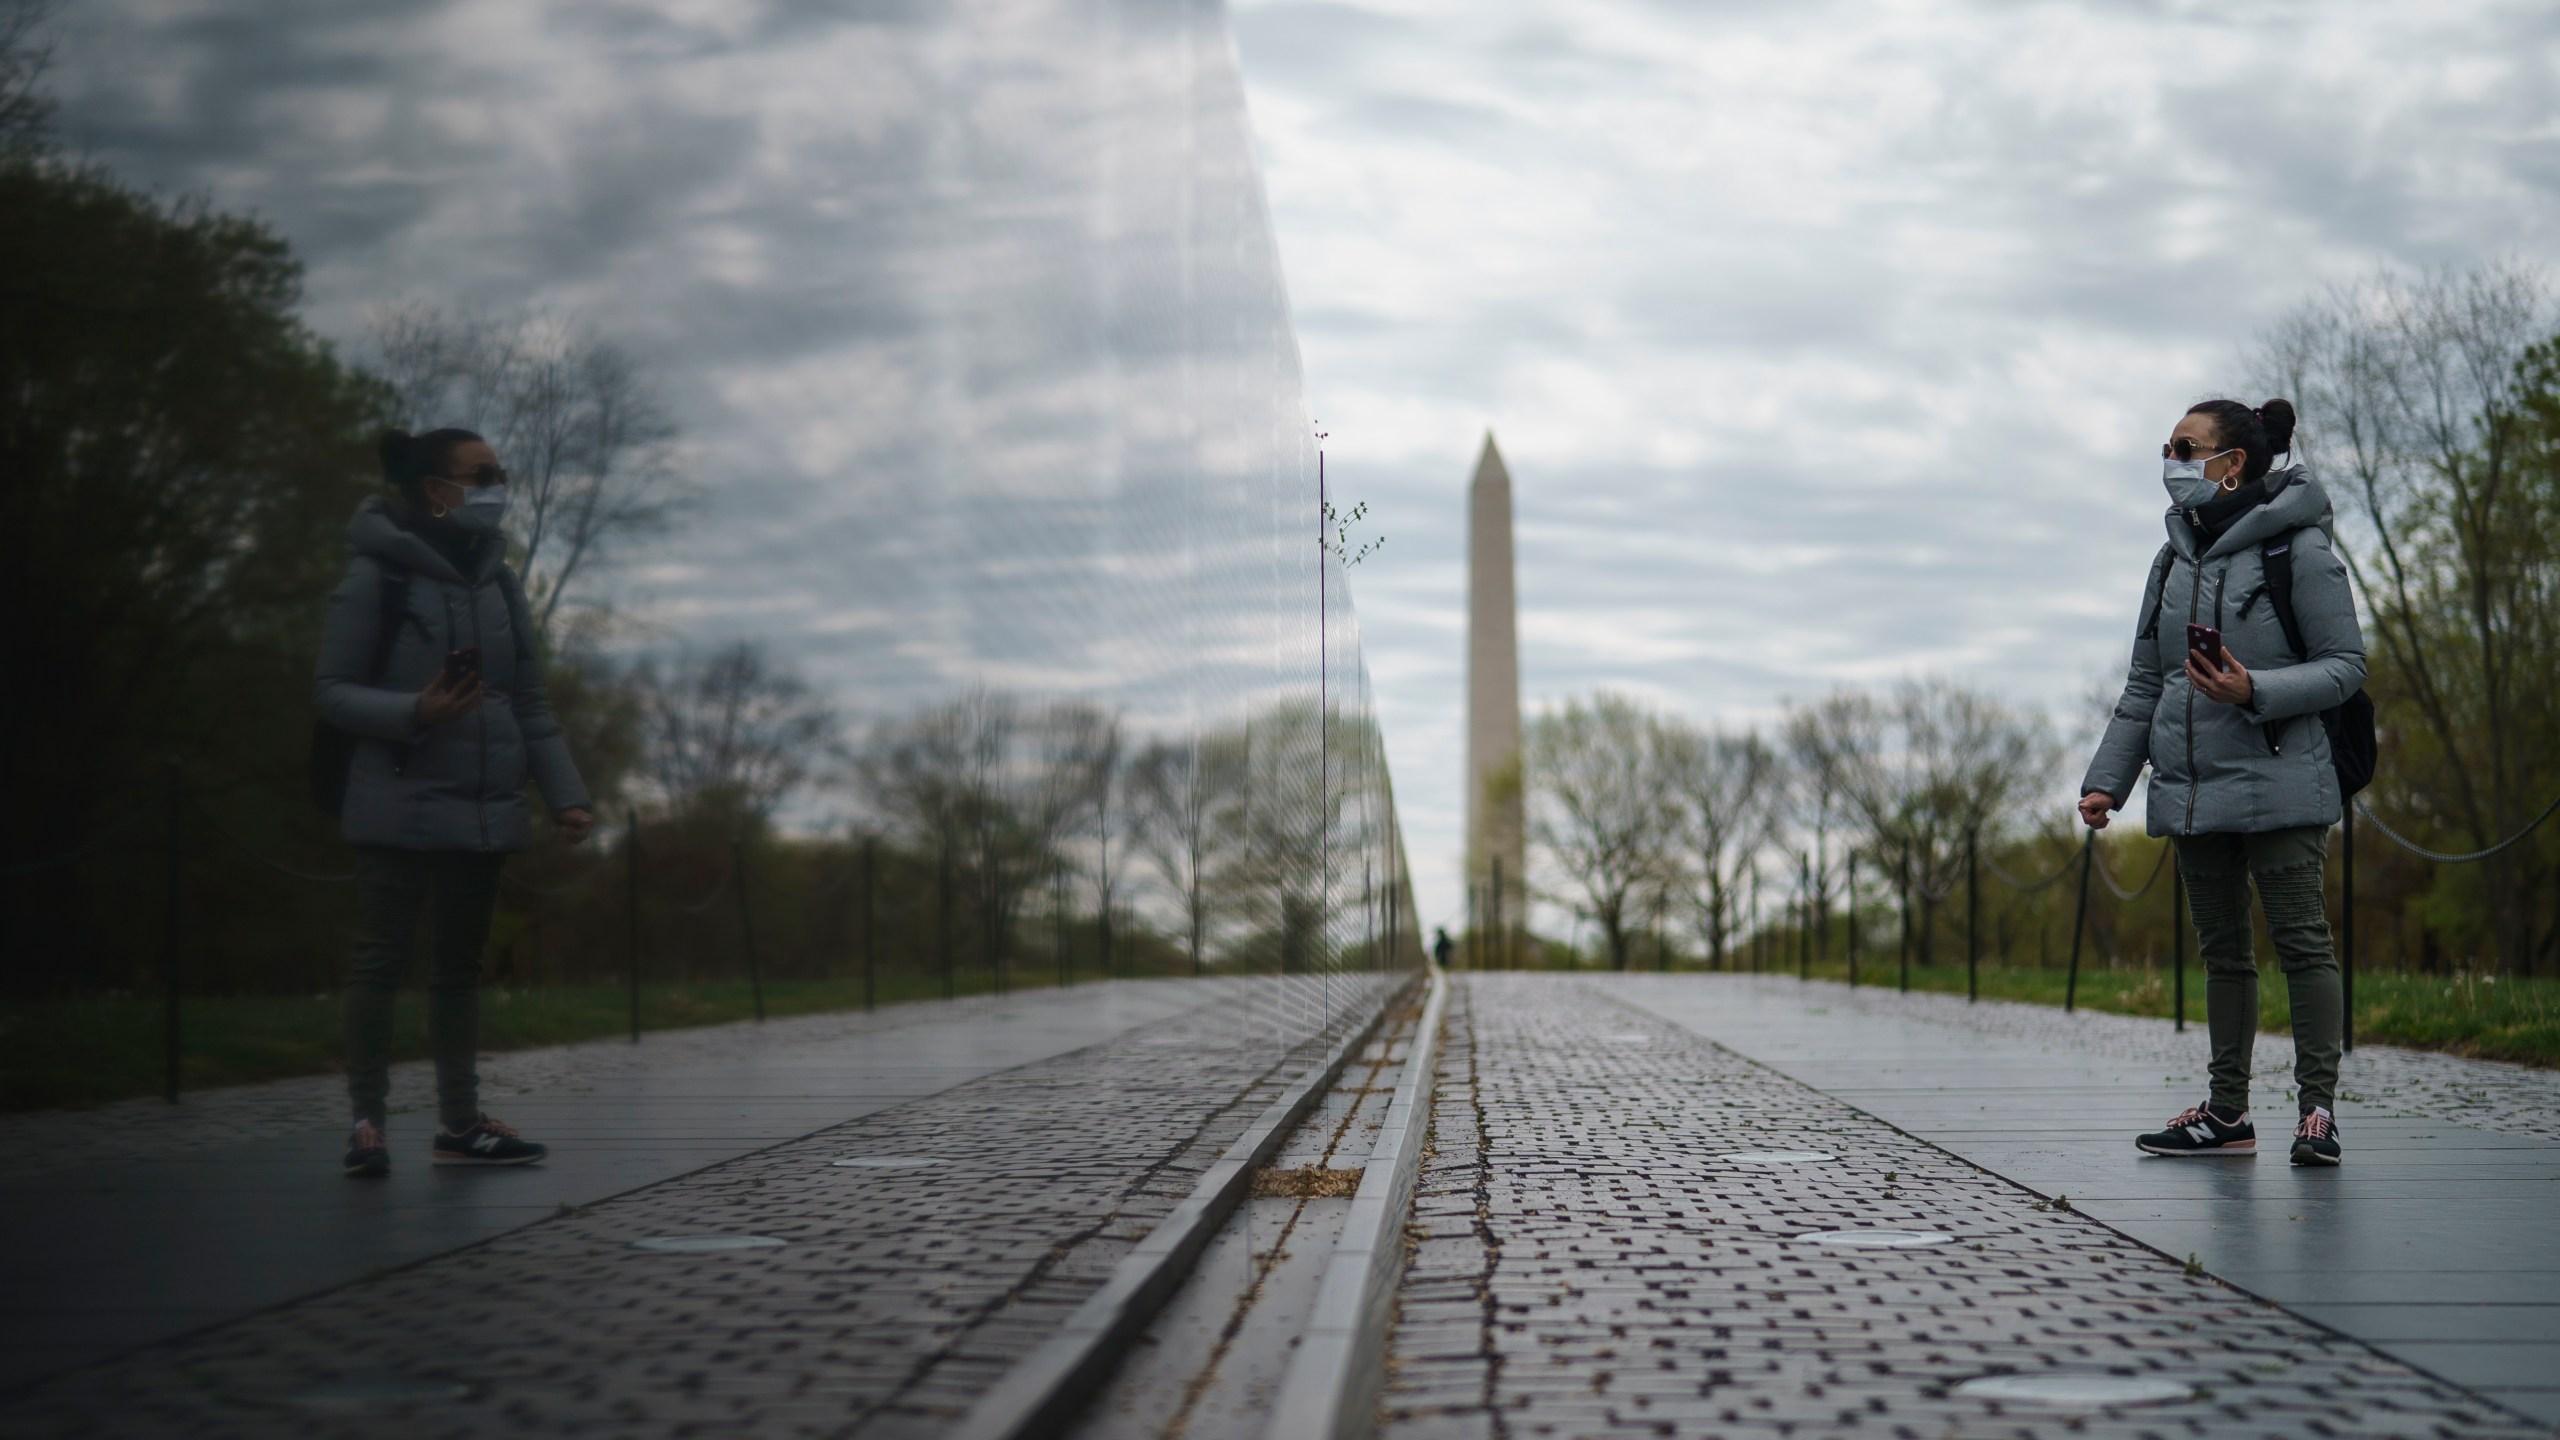 A woman visits an empty Vietnam Veterans Memorial on April 14, 2020, in Washington, D.C. (Drew Angerer/Getty Images)